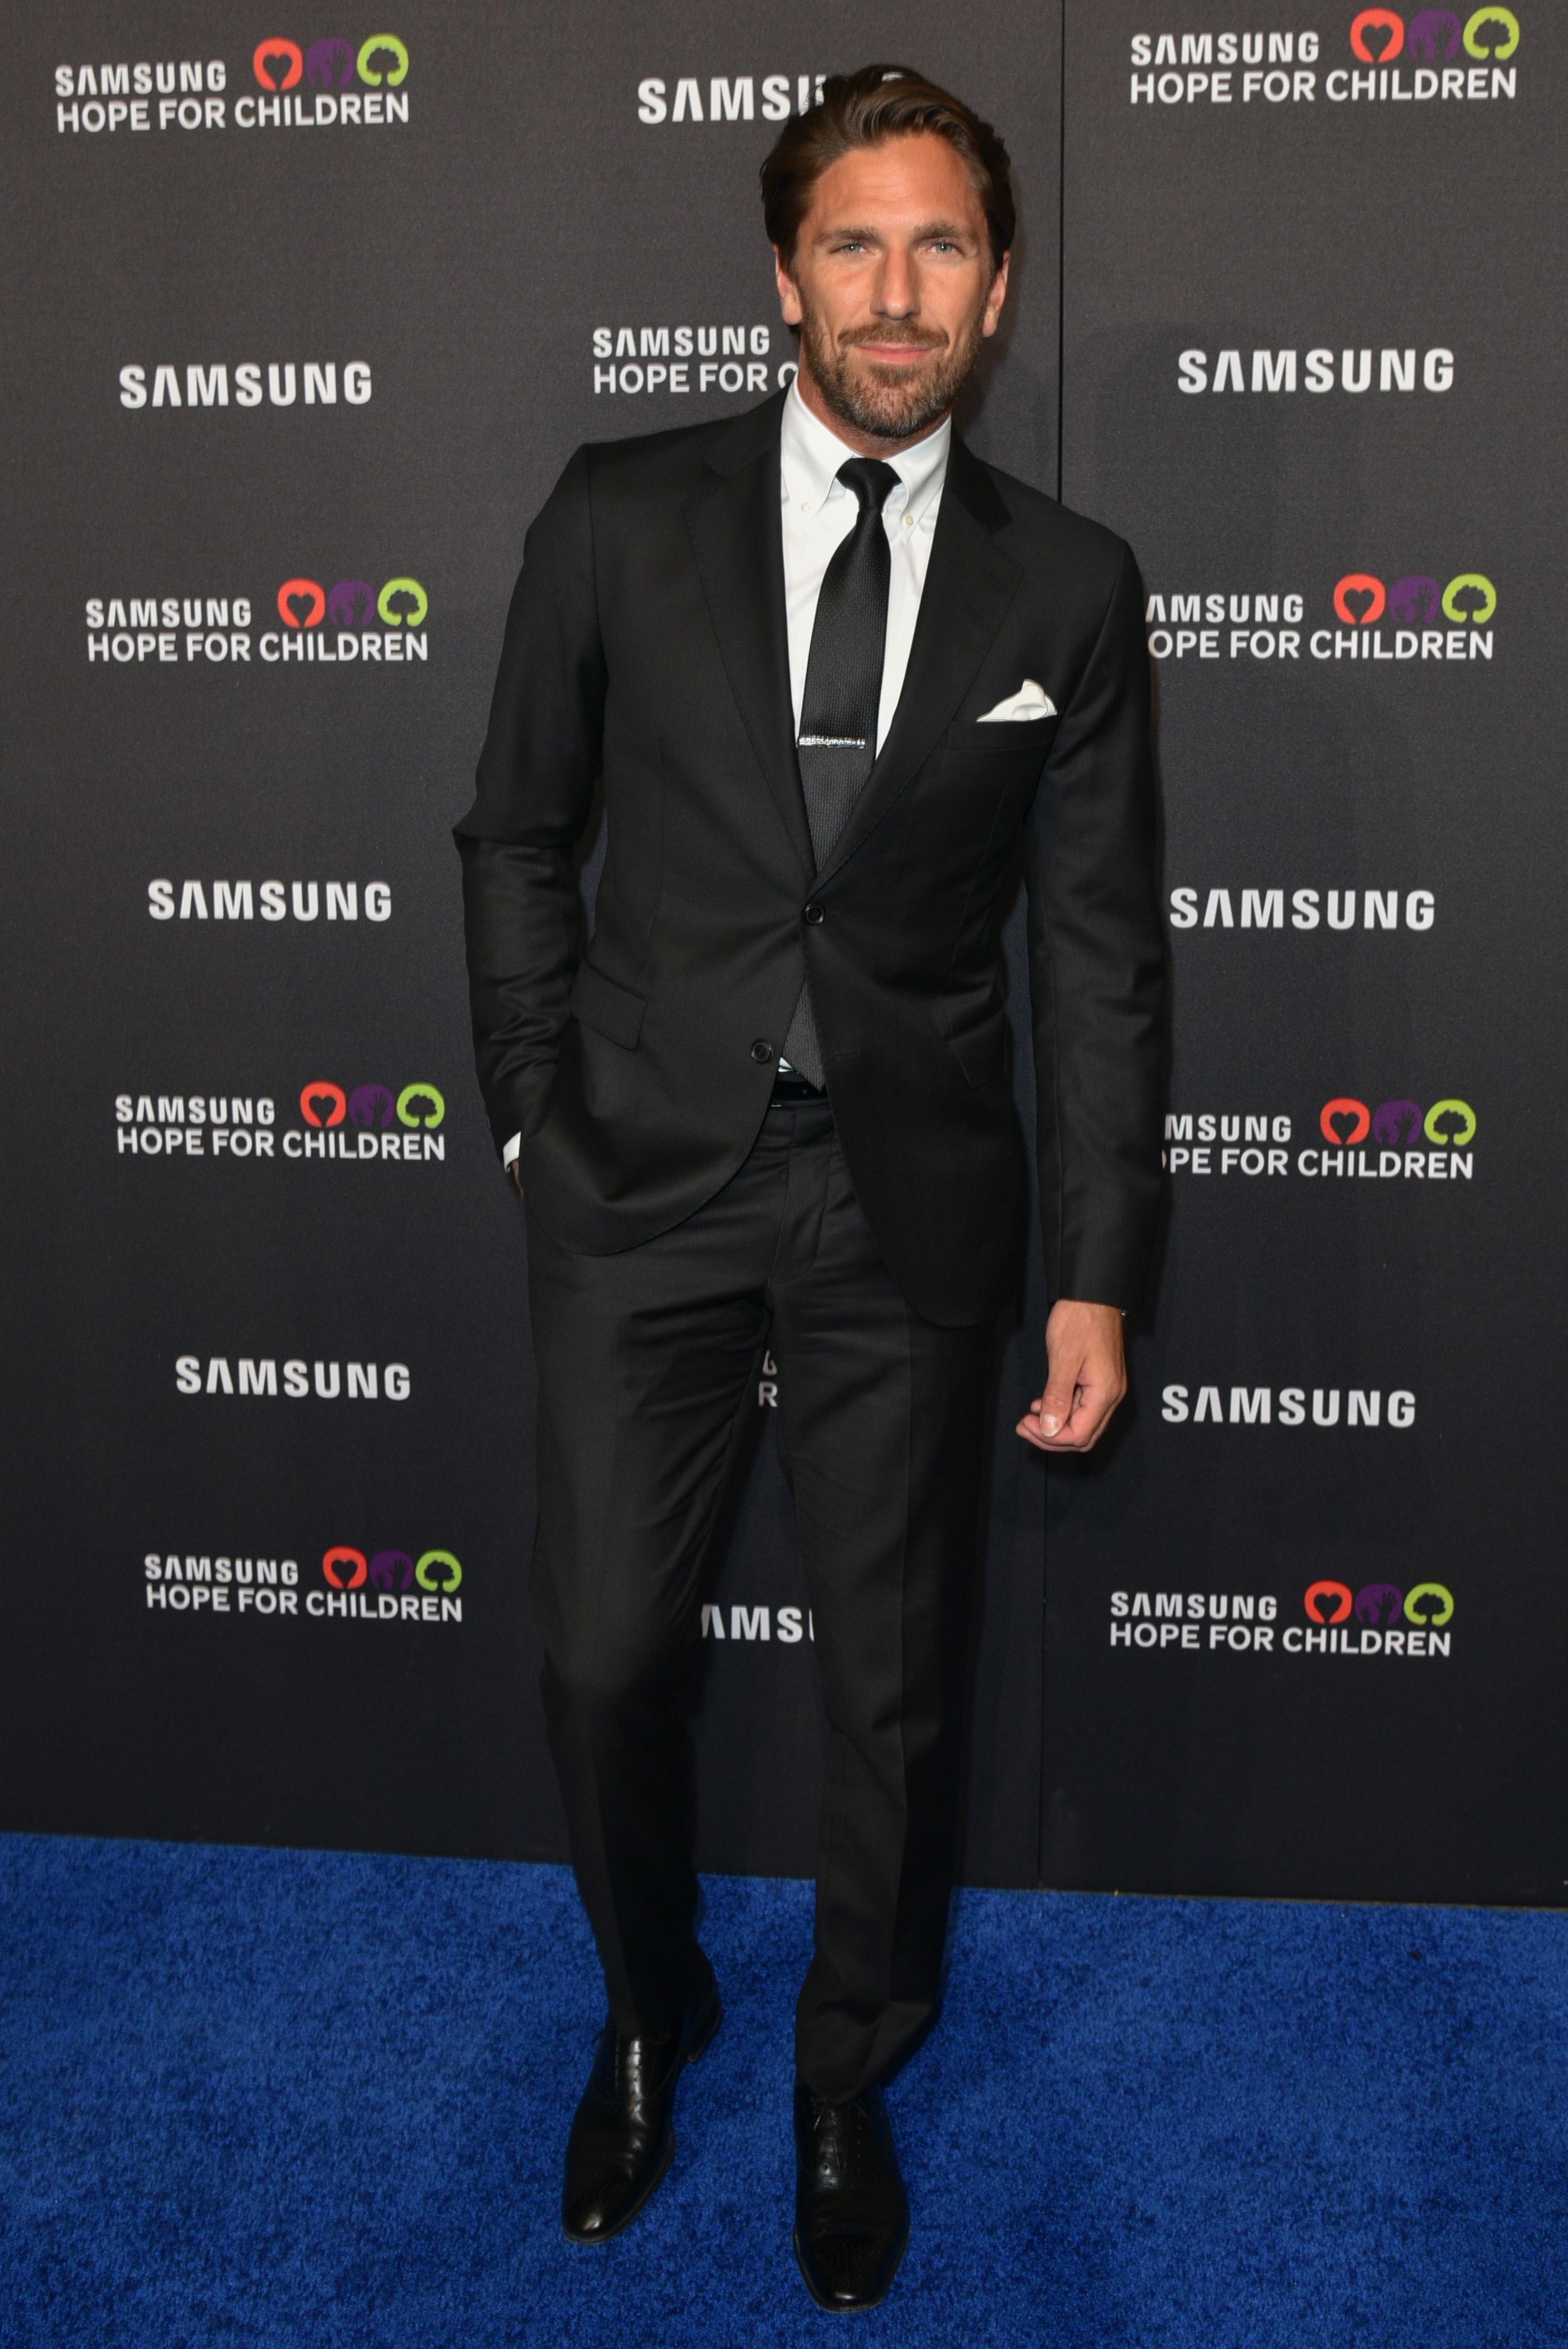 Samsung Hope for Children gala, New York, America - 17 Sep 2015